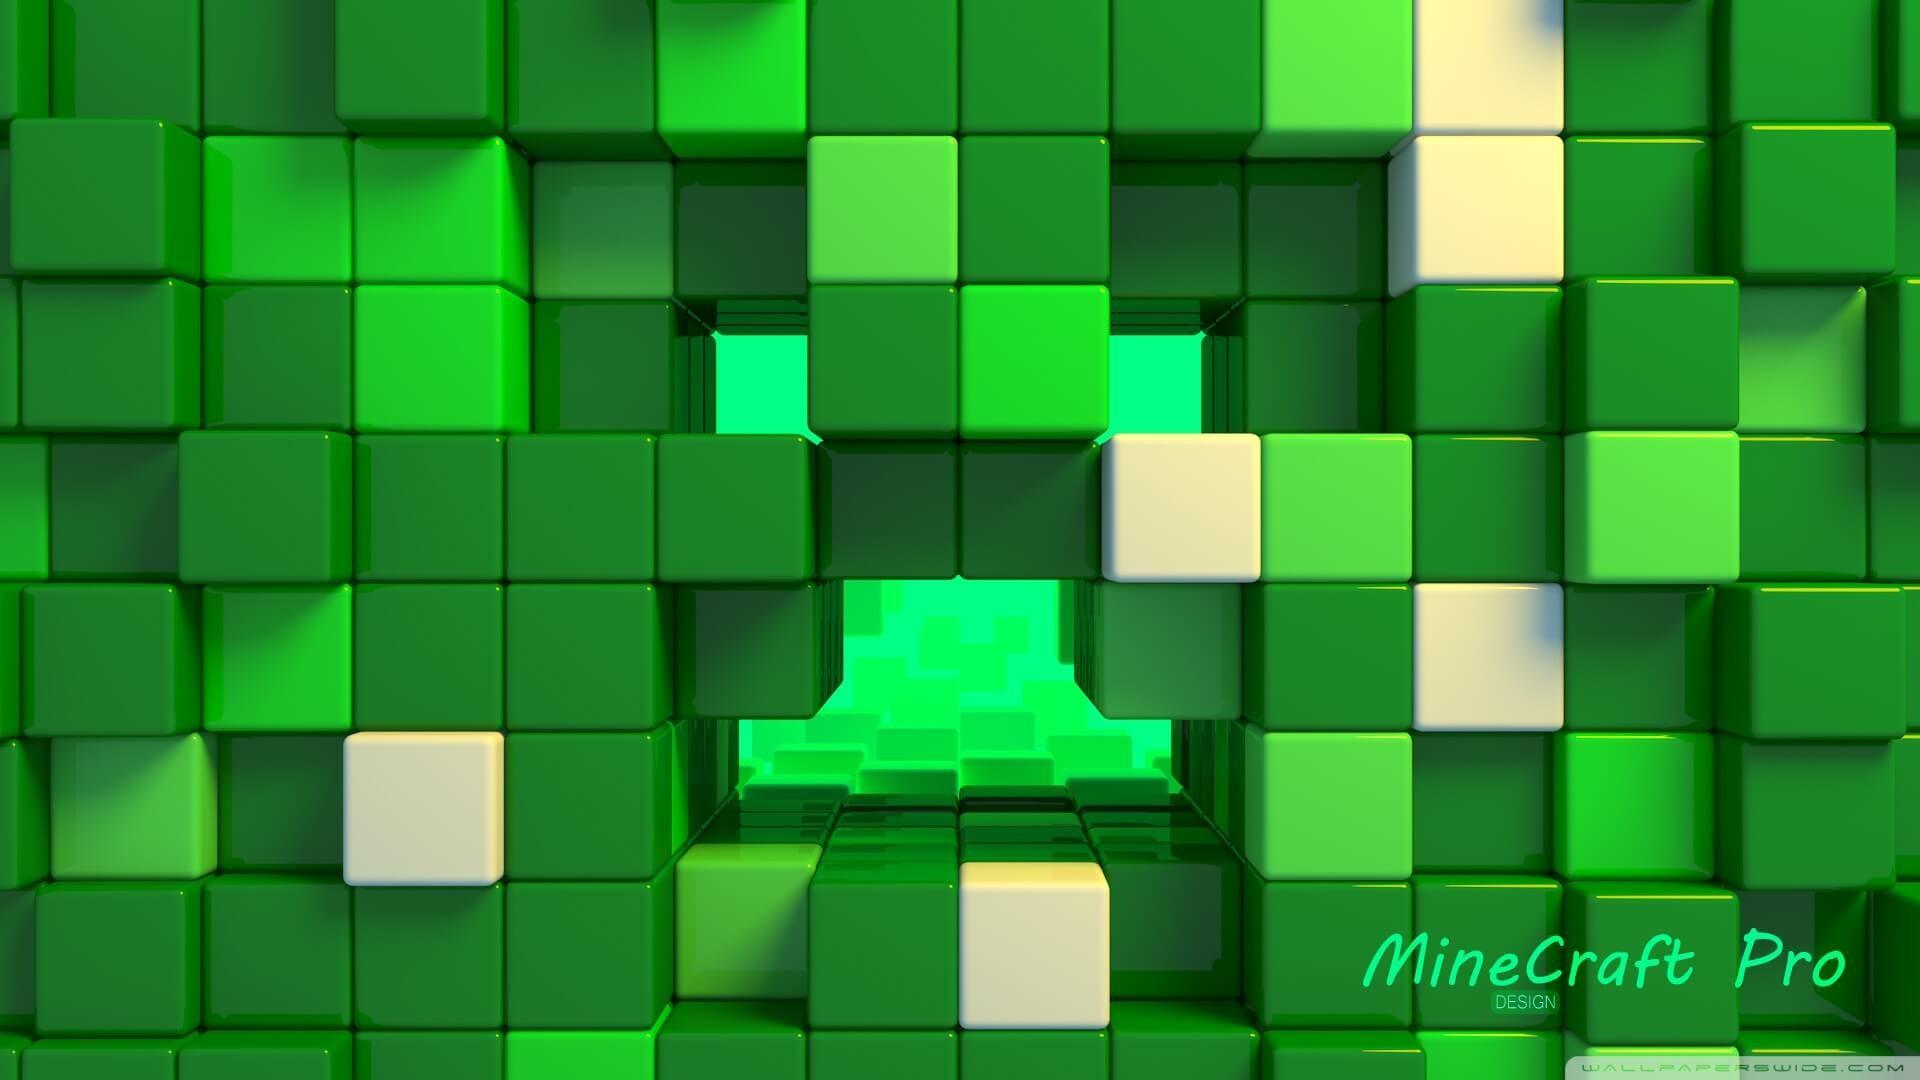 Res: 1920x1080, Minecraft Wallpaper (24)